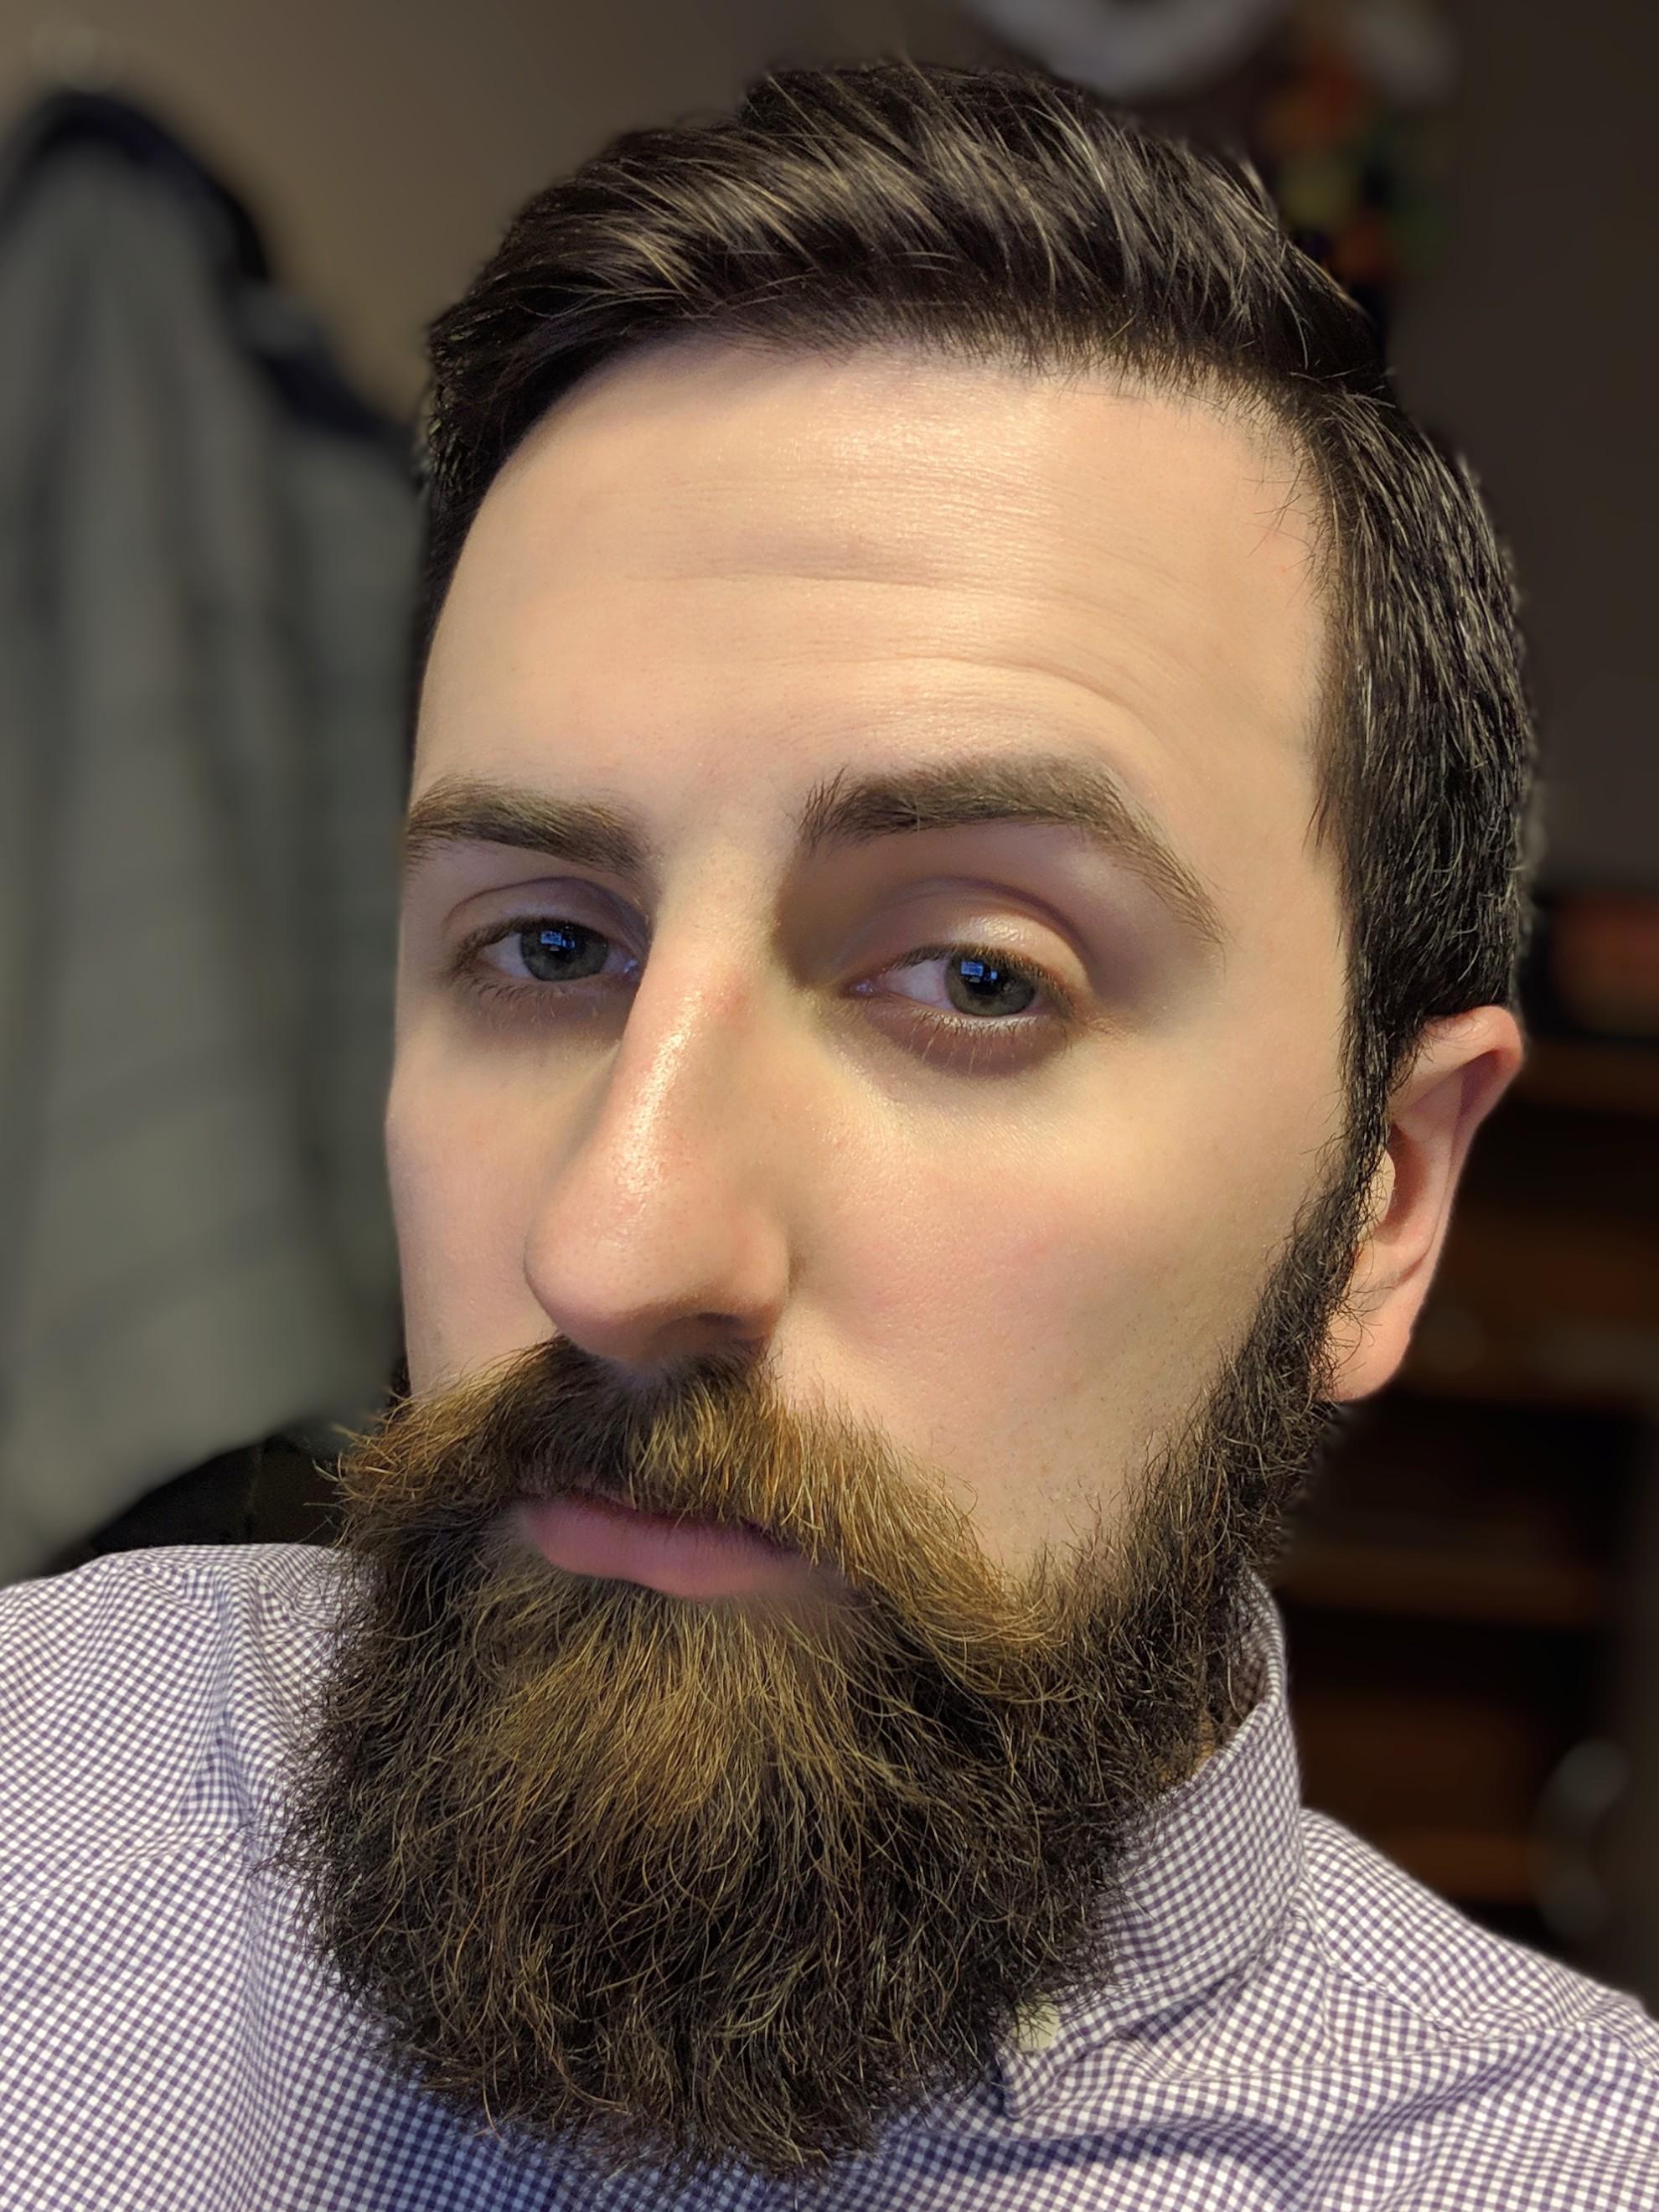 Raise One Eyebrow : raise, eyebrow, Smile,, Narrow, Slightly,, Raise, Eyebrow,, Beard., Perfect, Selfie., Beards